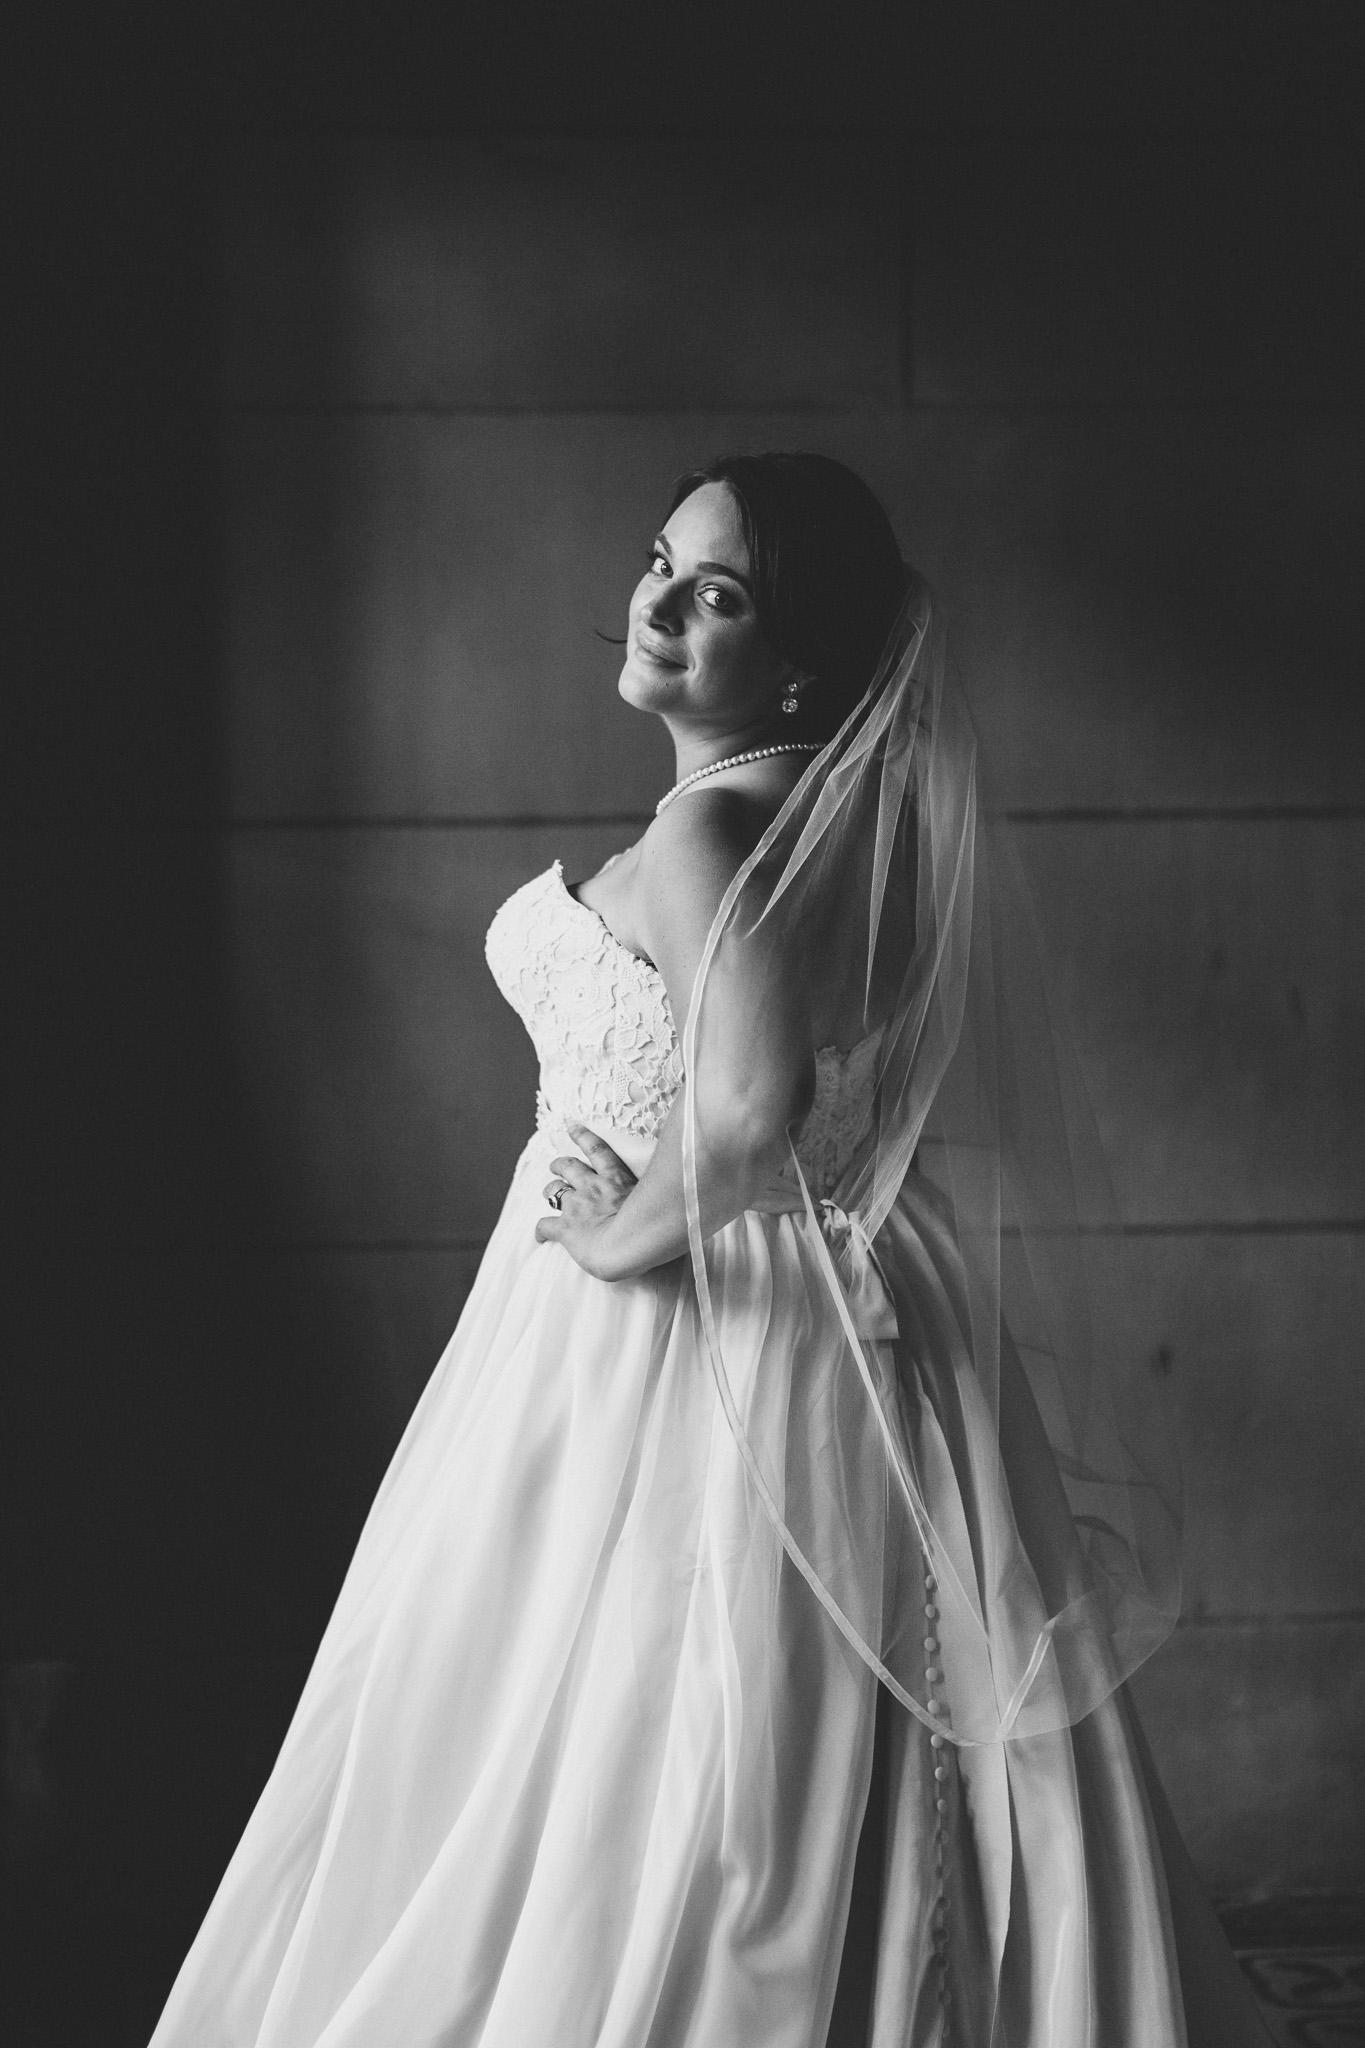 Romantic Black and White Portraits